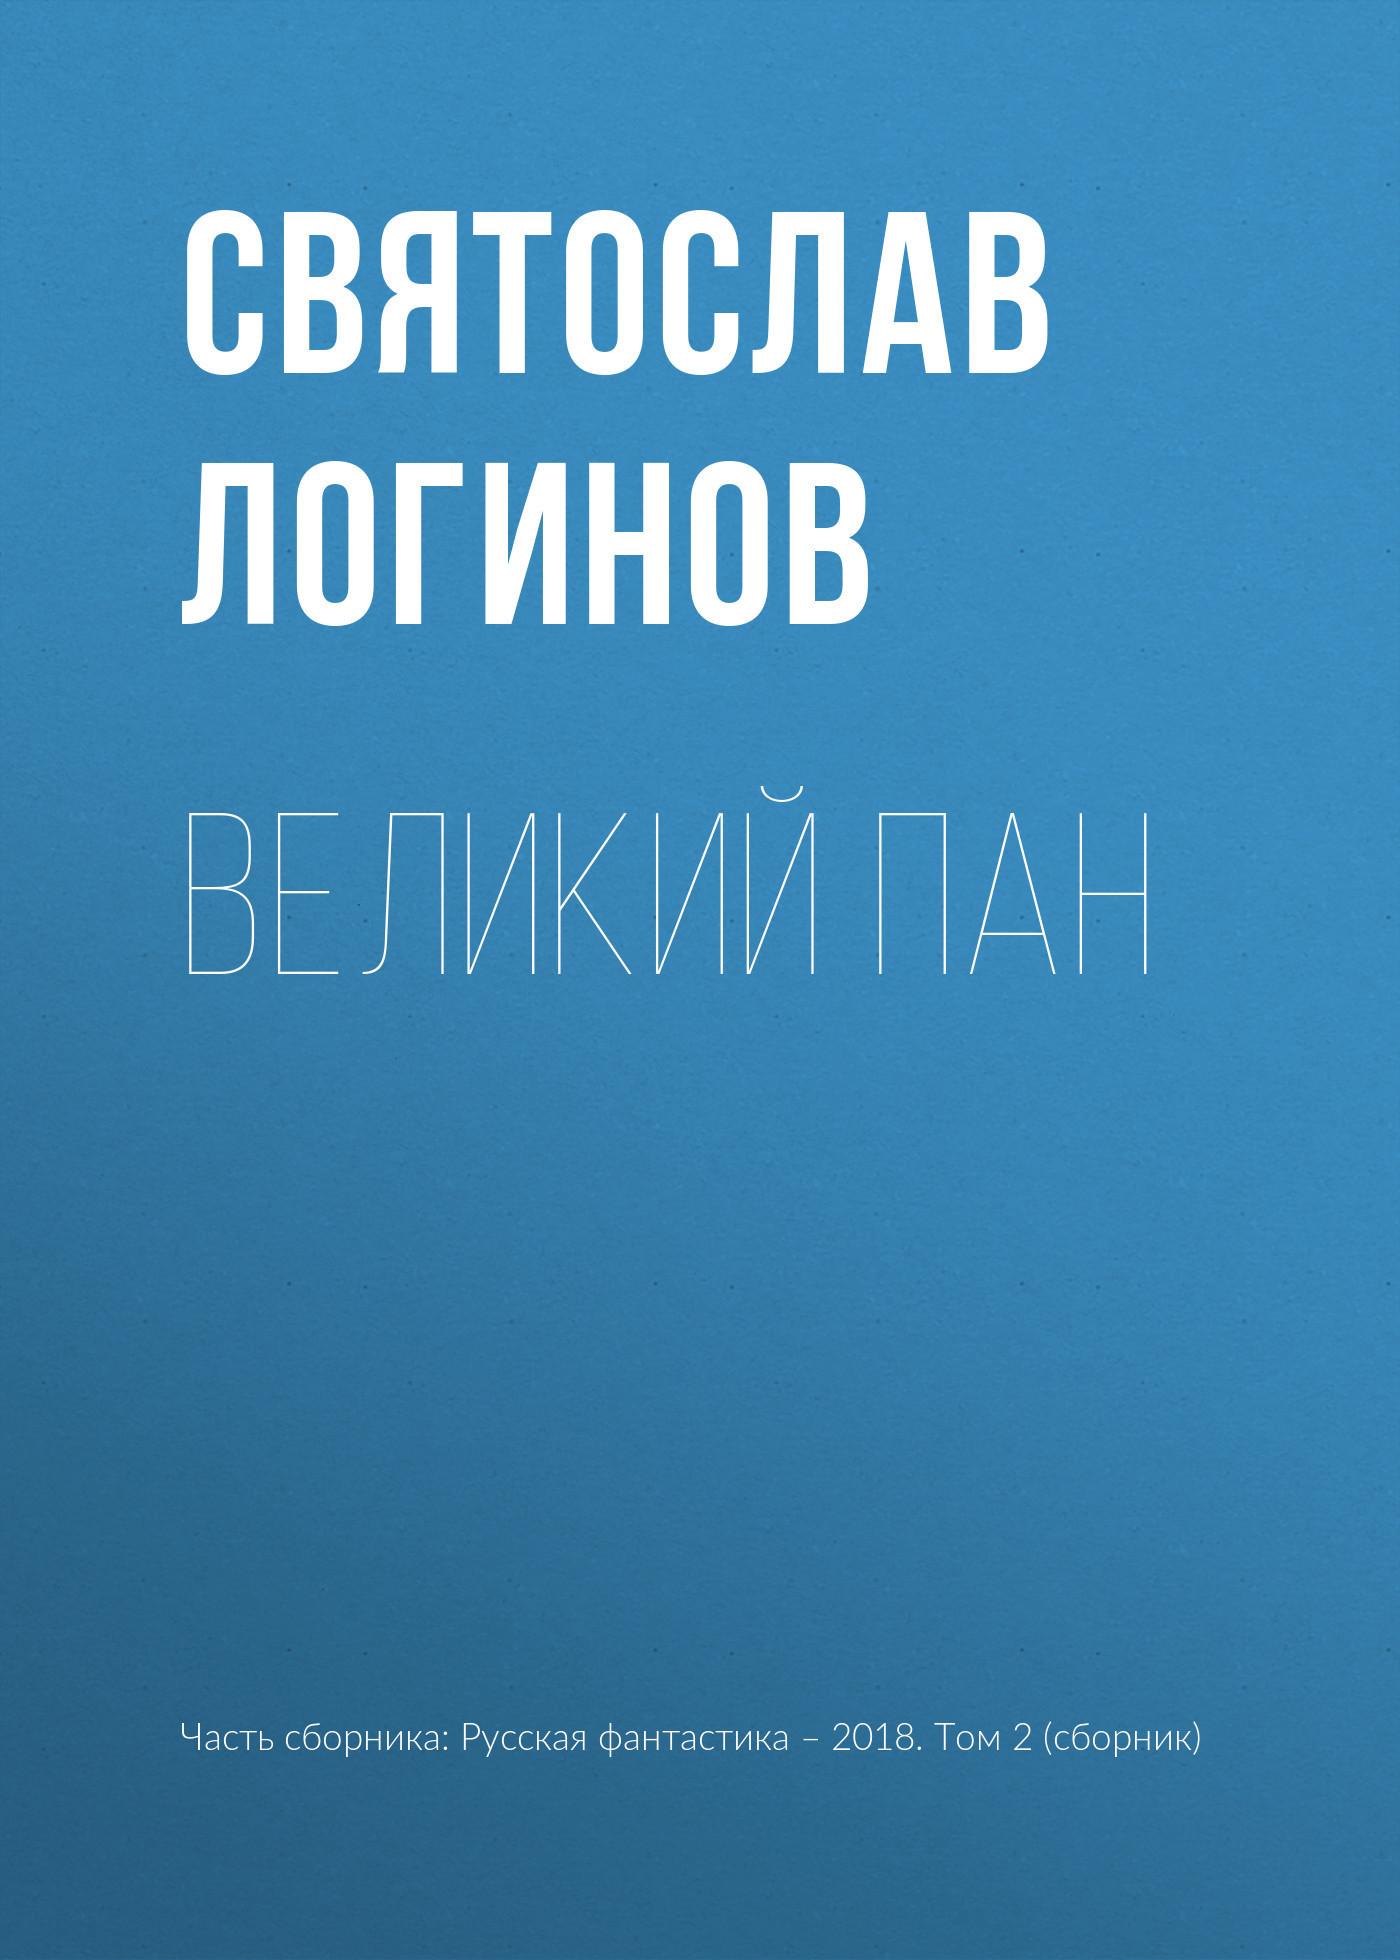 Святослав Логинов - Великий пан